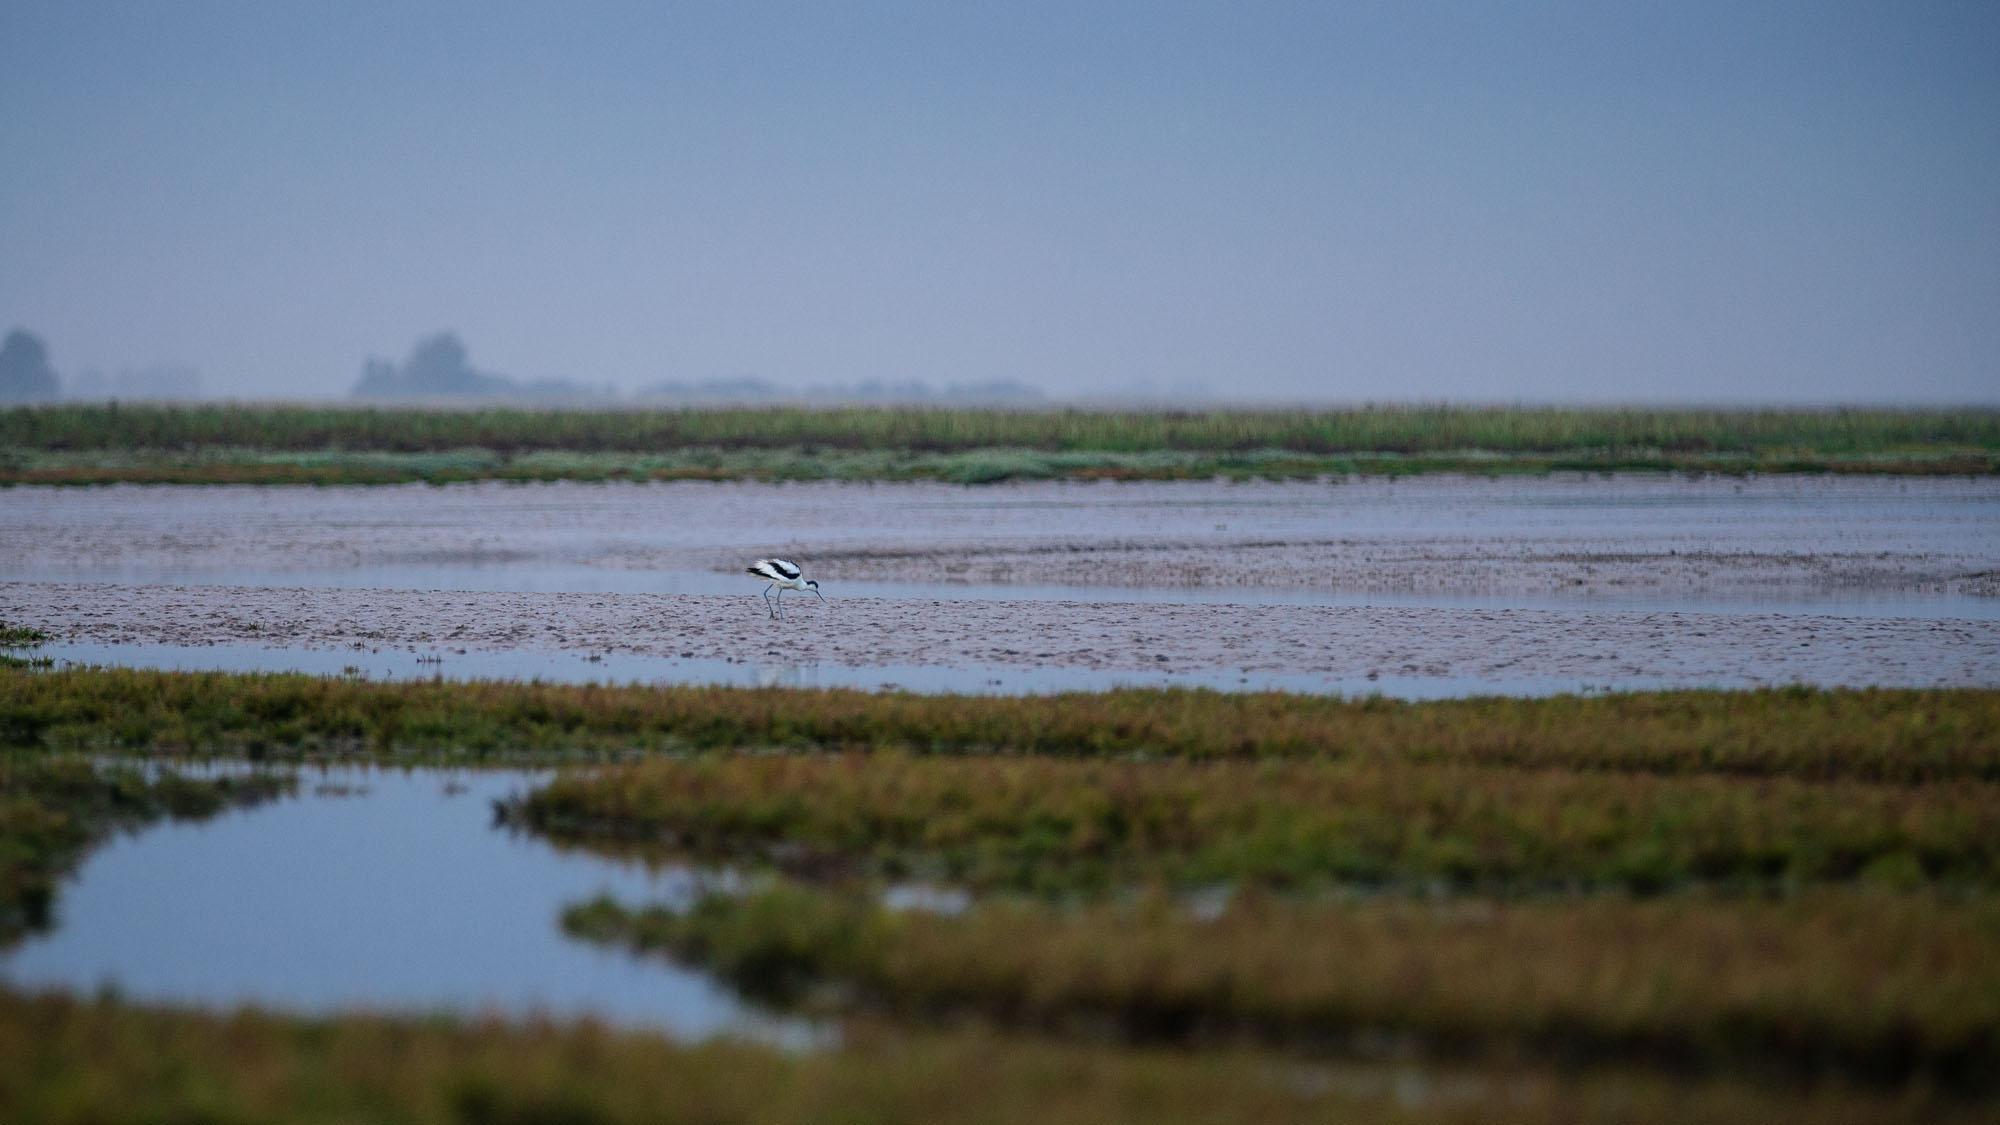 Avocet at Low Tide, The Wash - Norfolk